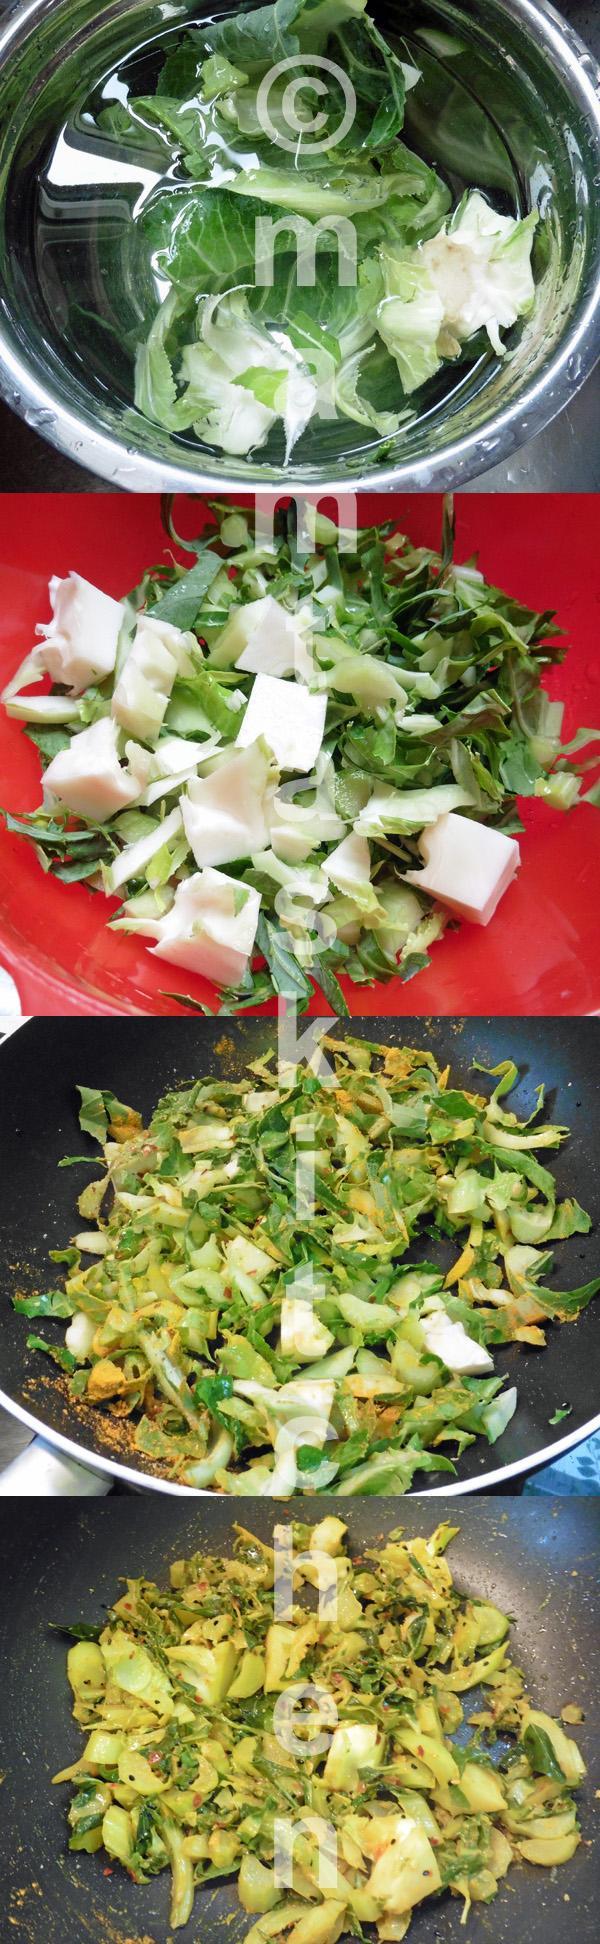 Cauliflower Greens or Leaves And Stalk Bhaji (Dry Curry)